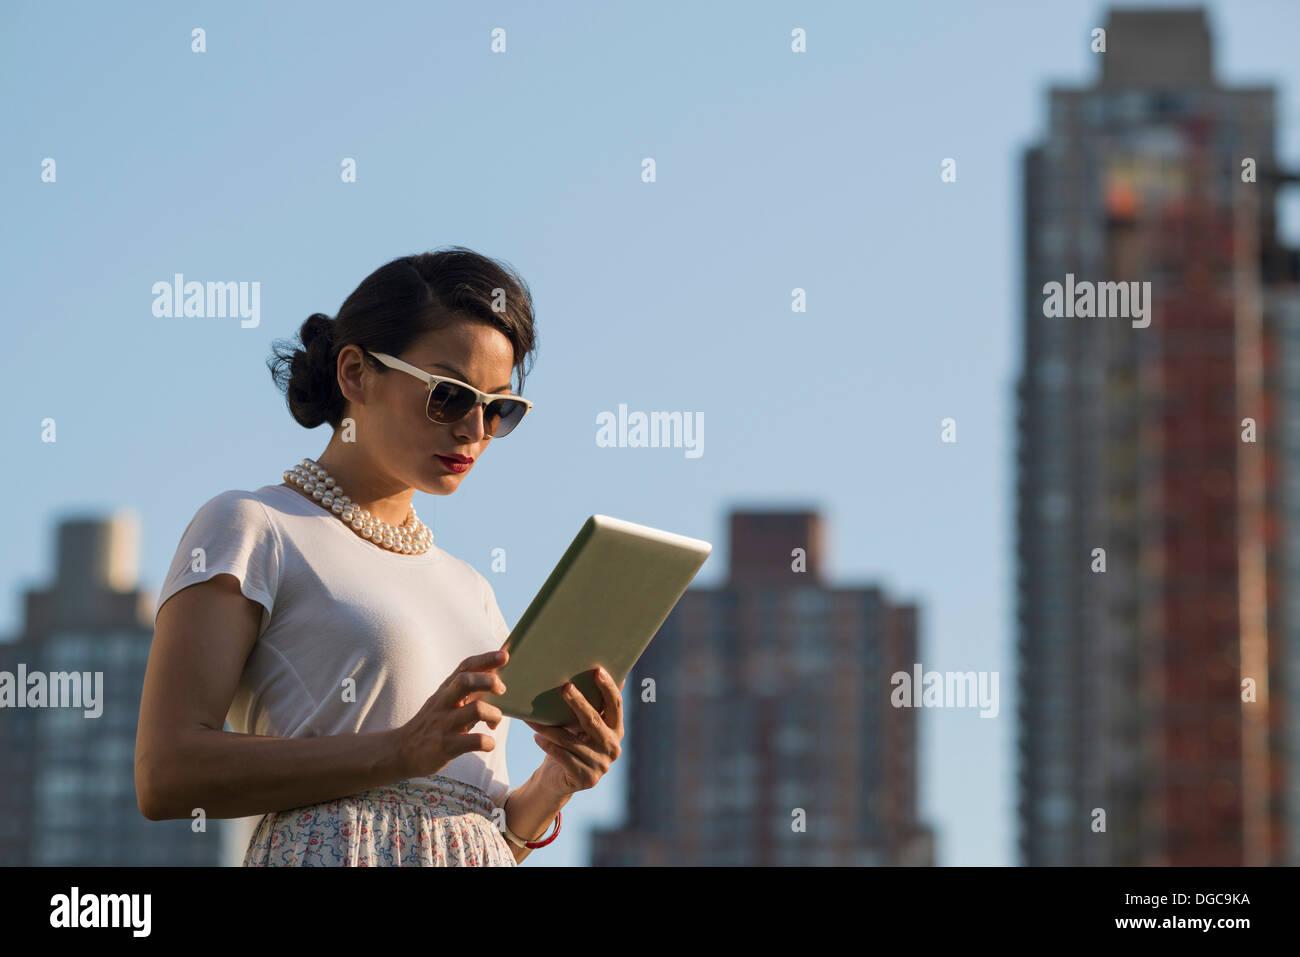 Mid adult women using digital tablet, Manhattan, New York - Stock Image